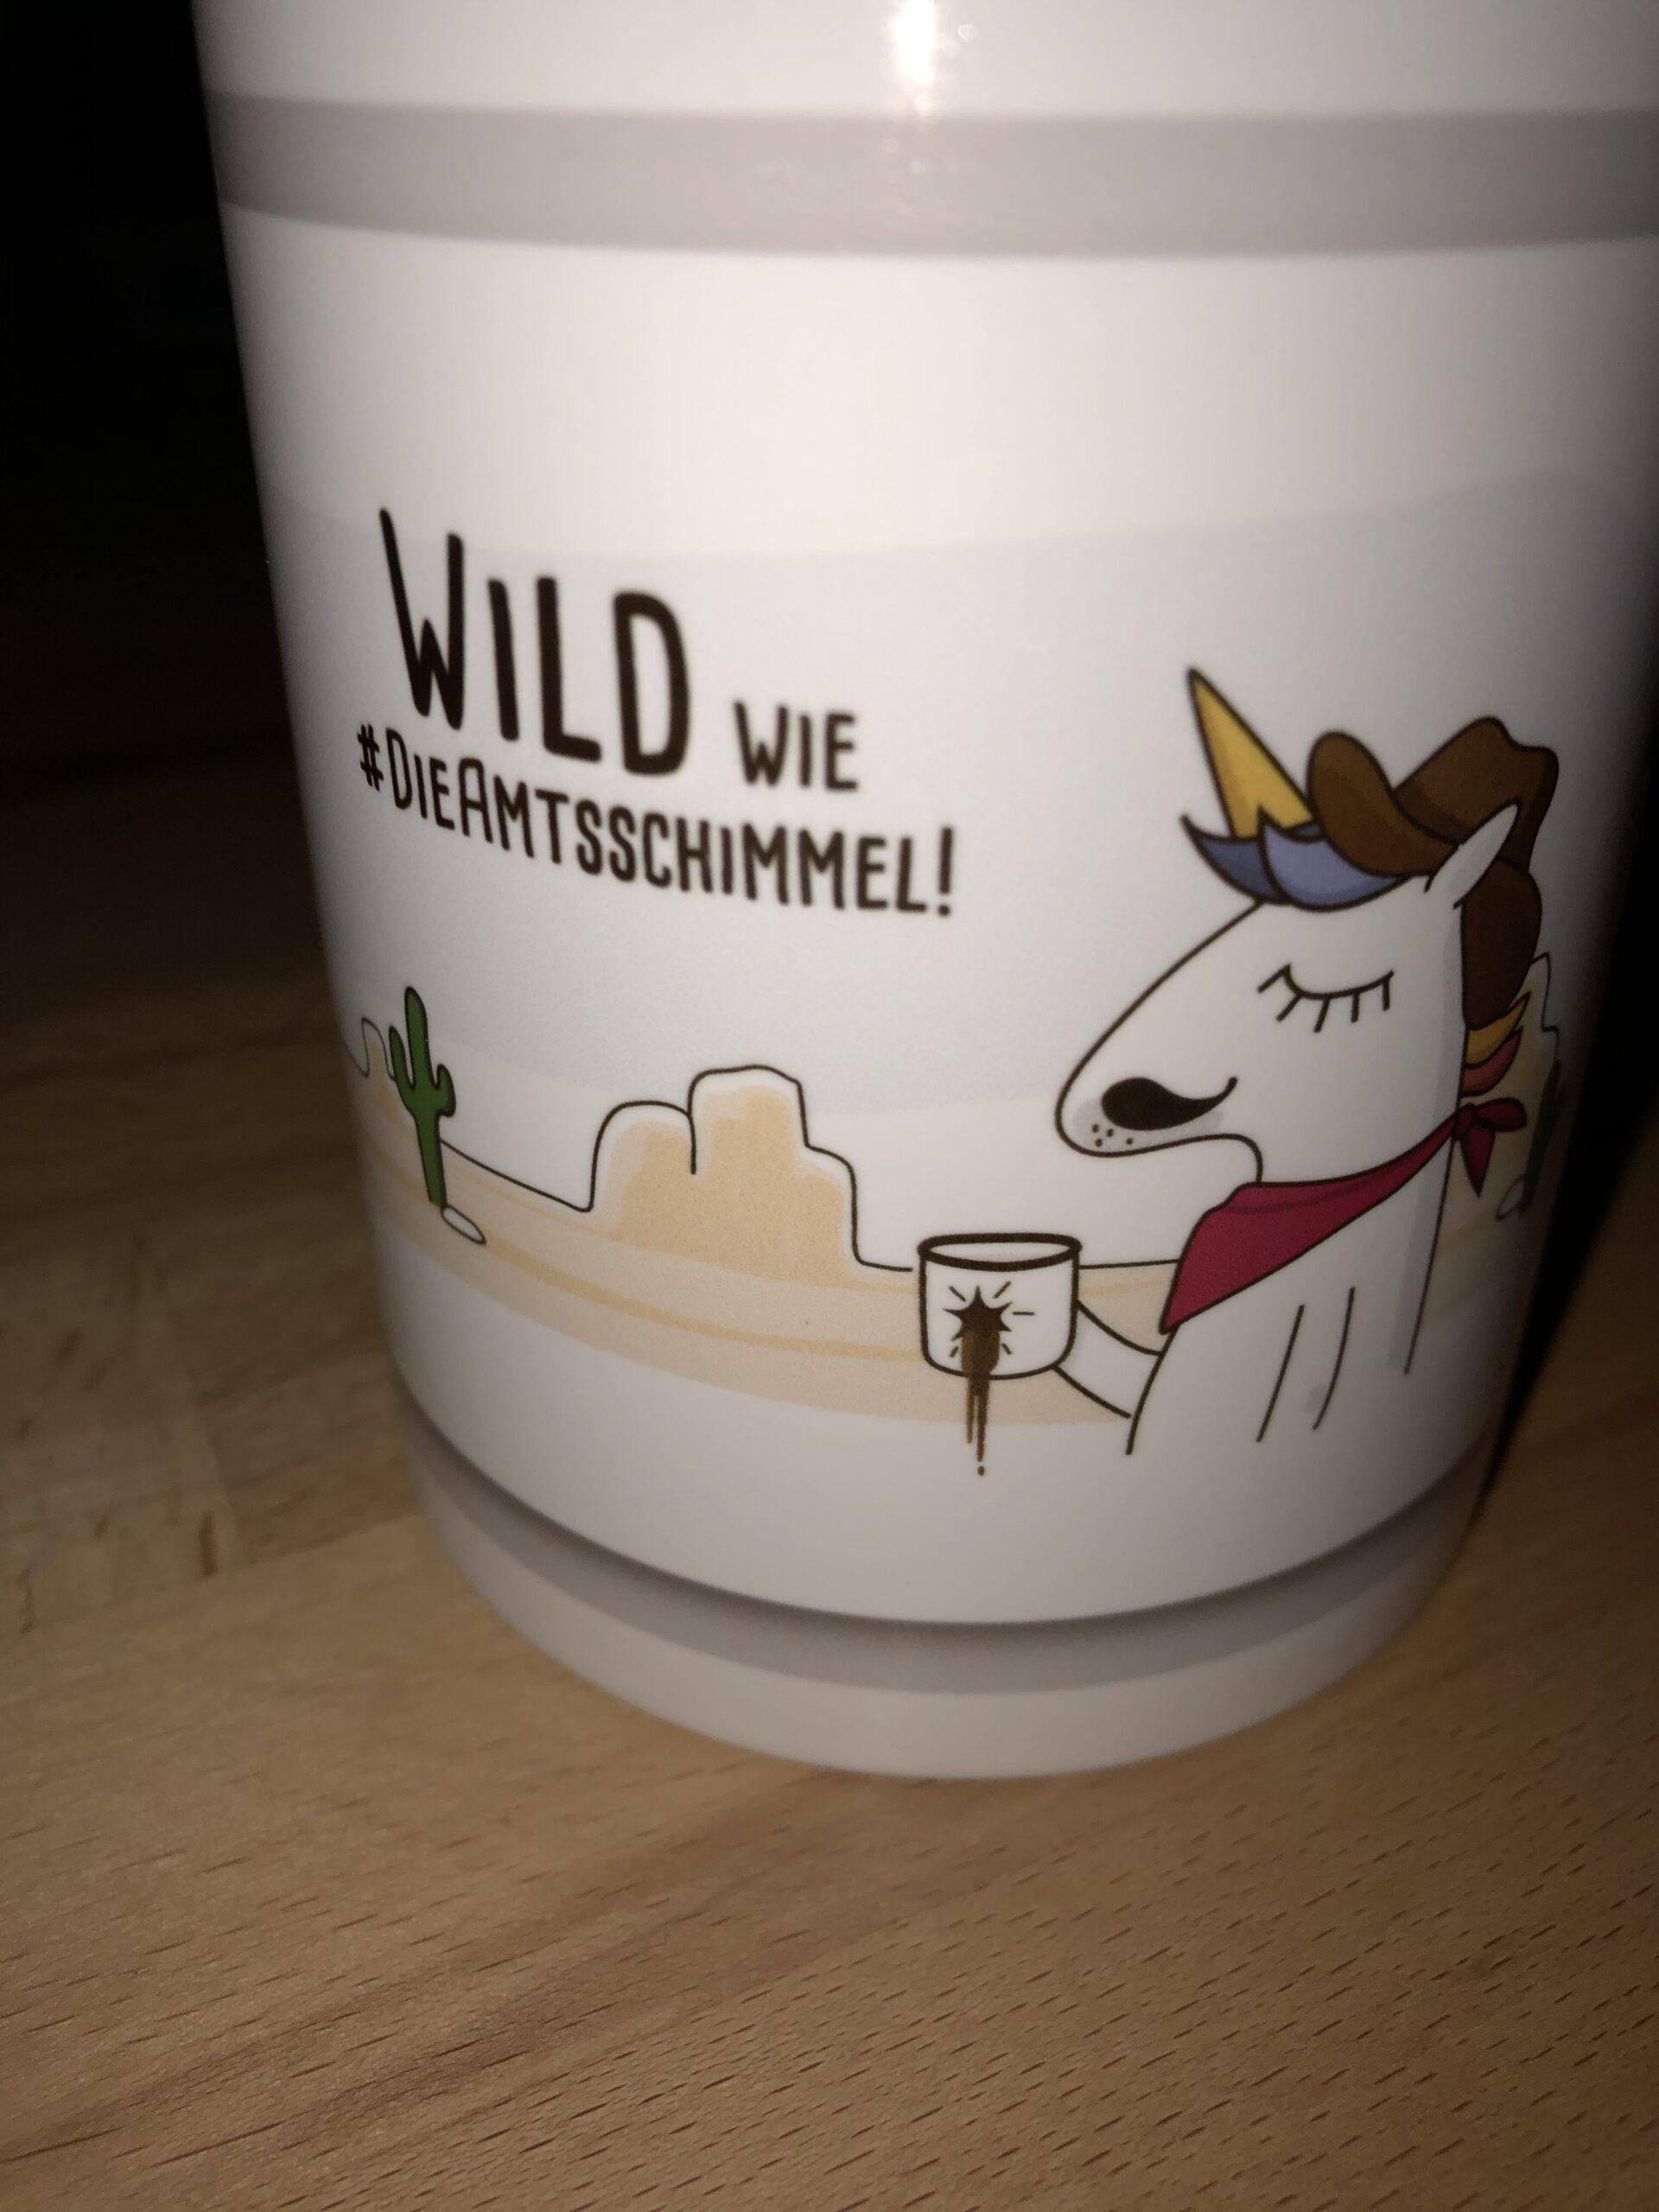 Read more about the article Etwas zum schmunzeln